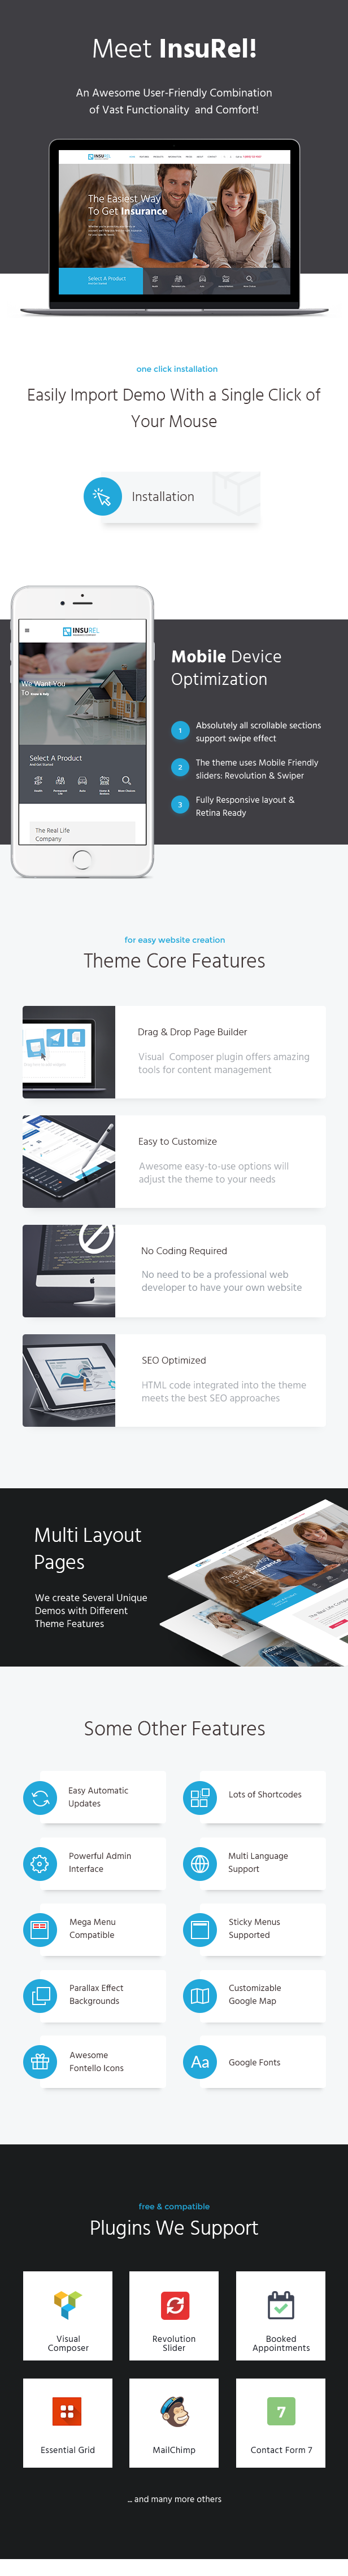 InsuRel | Insurance & Finance WordPress Theme - 2